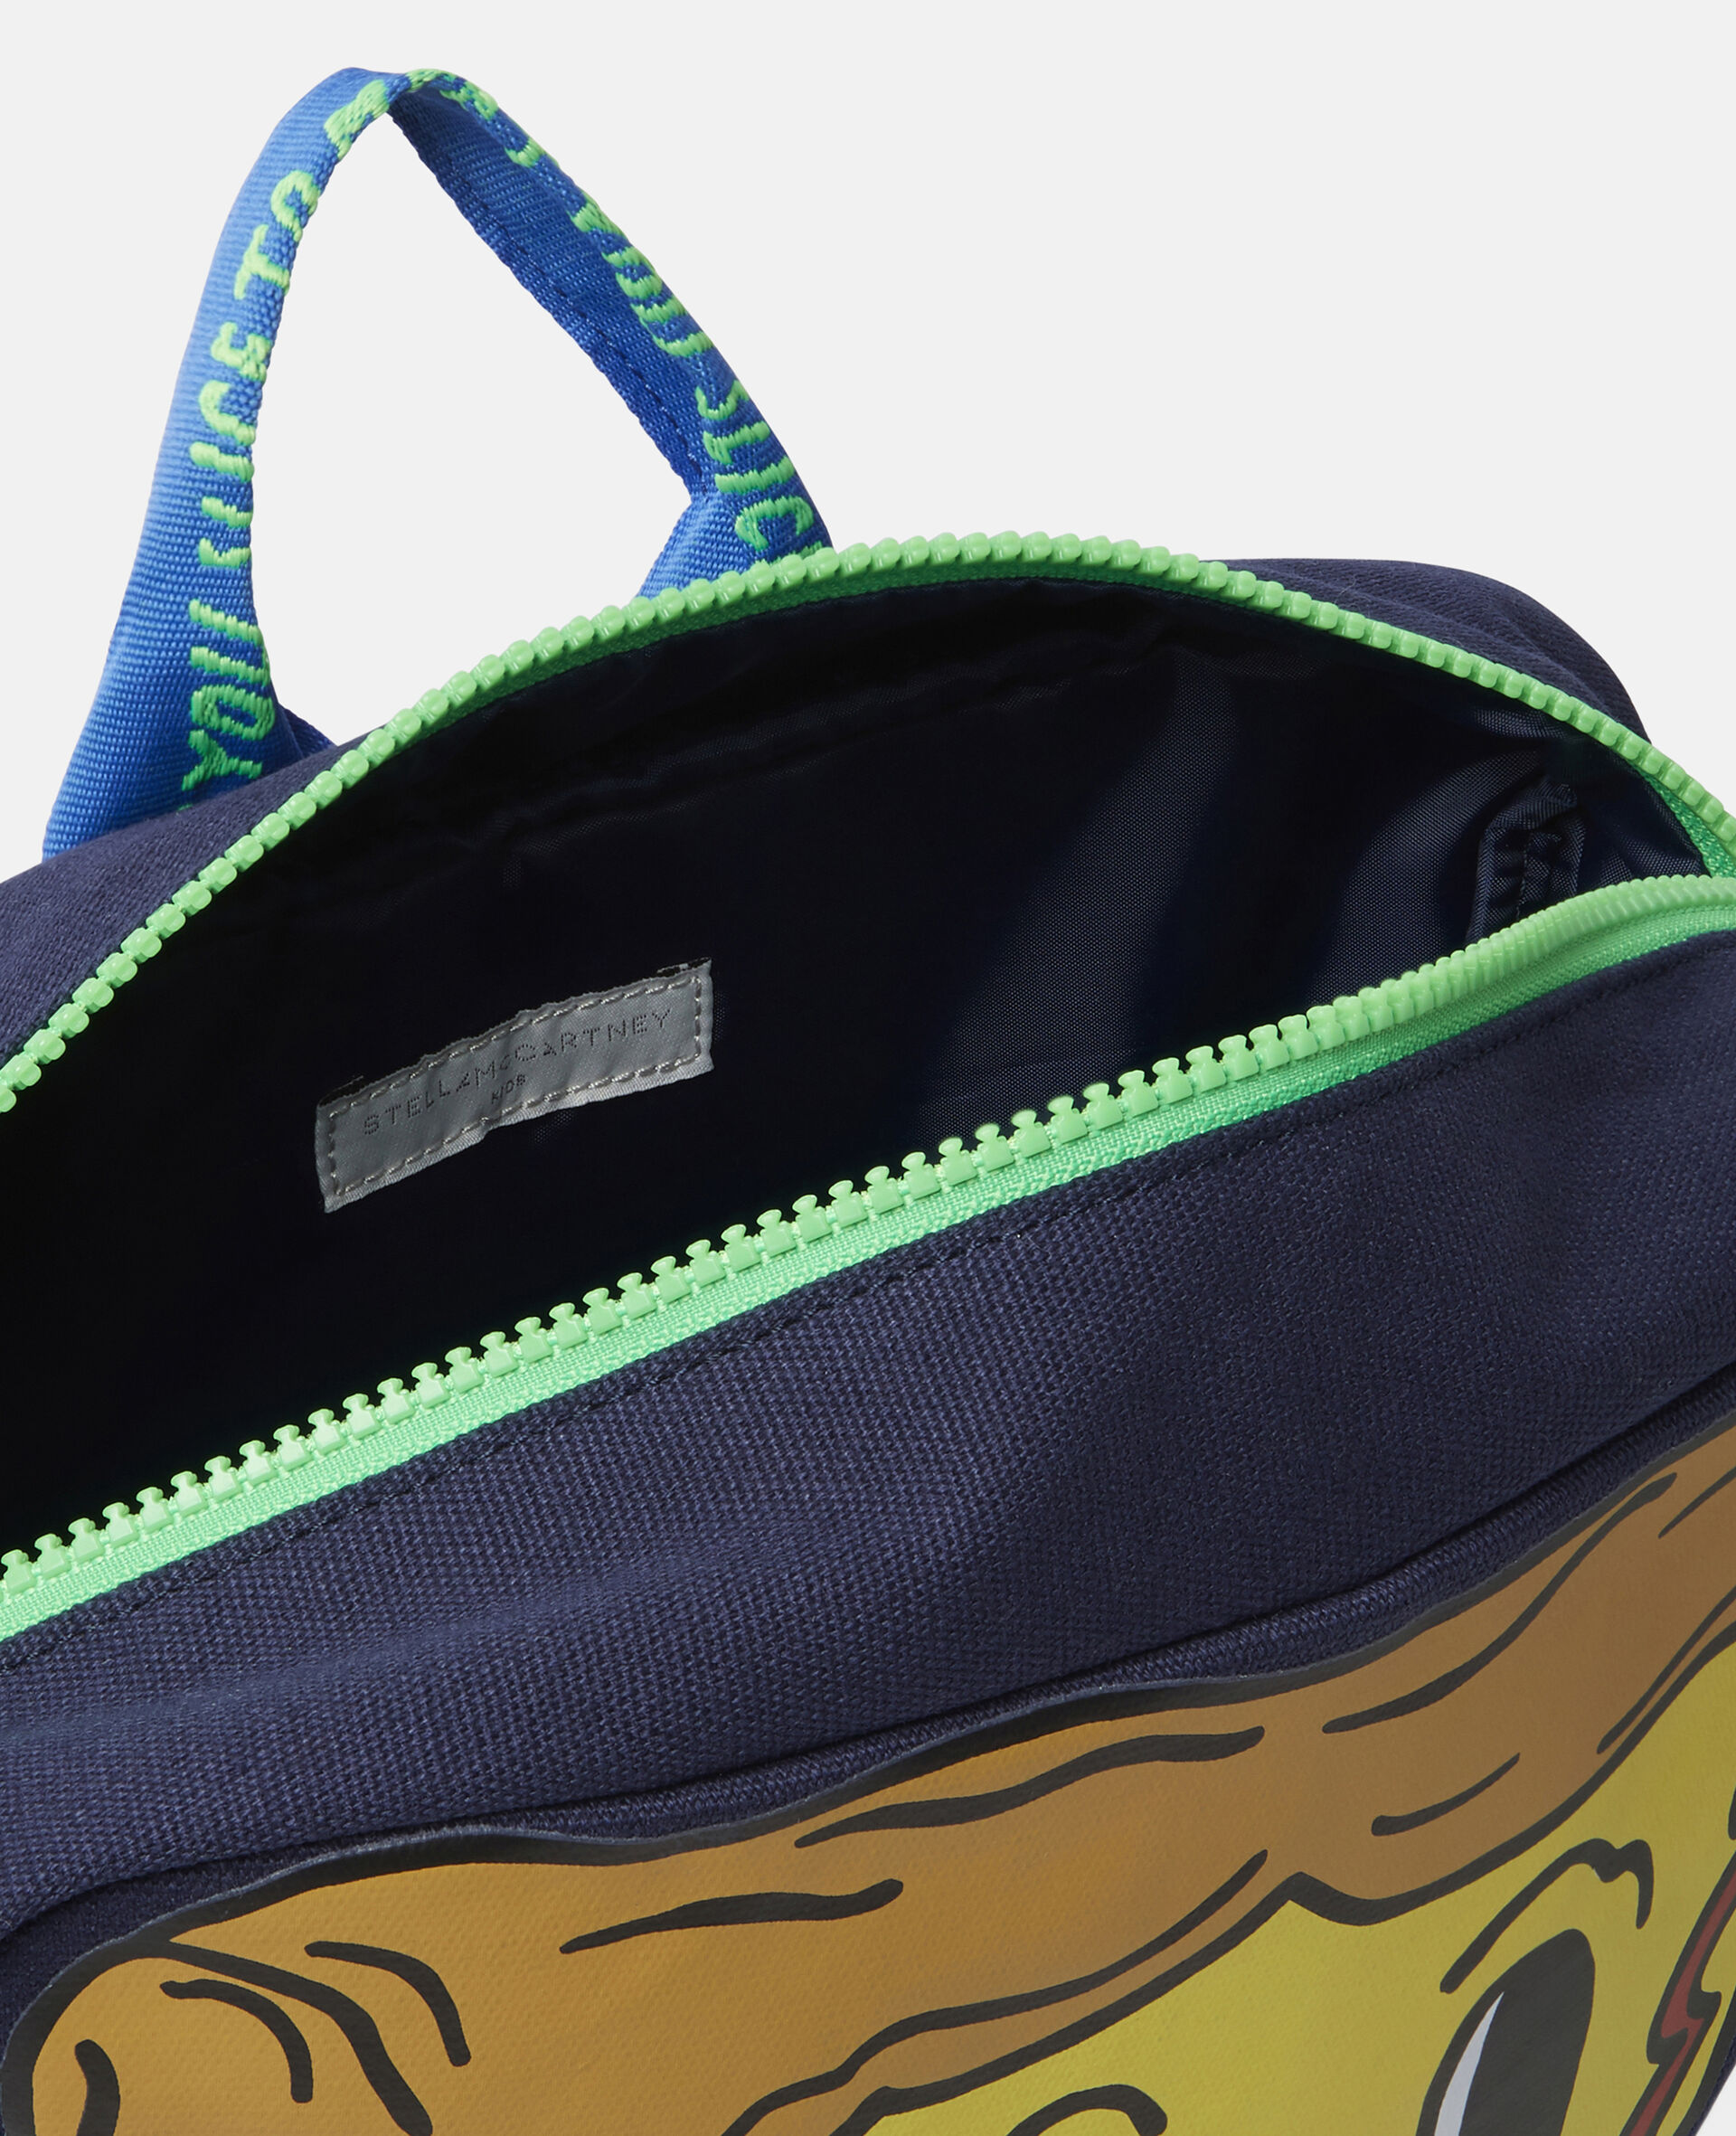 Canvas-Rucksack in Pizzastückform-Blau-large image number 2